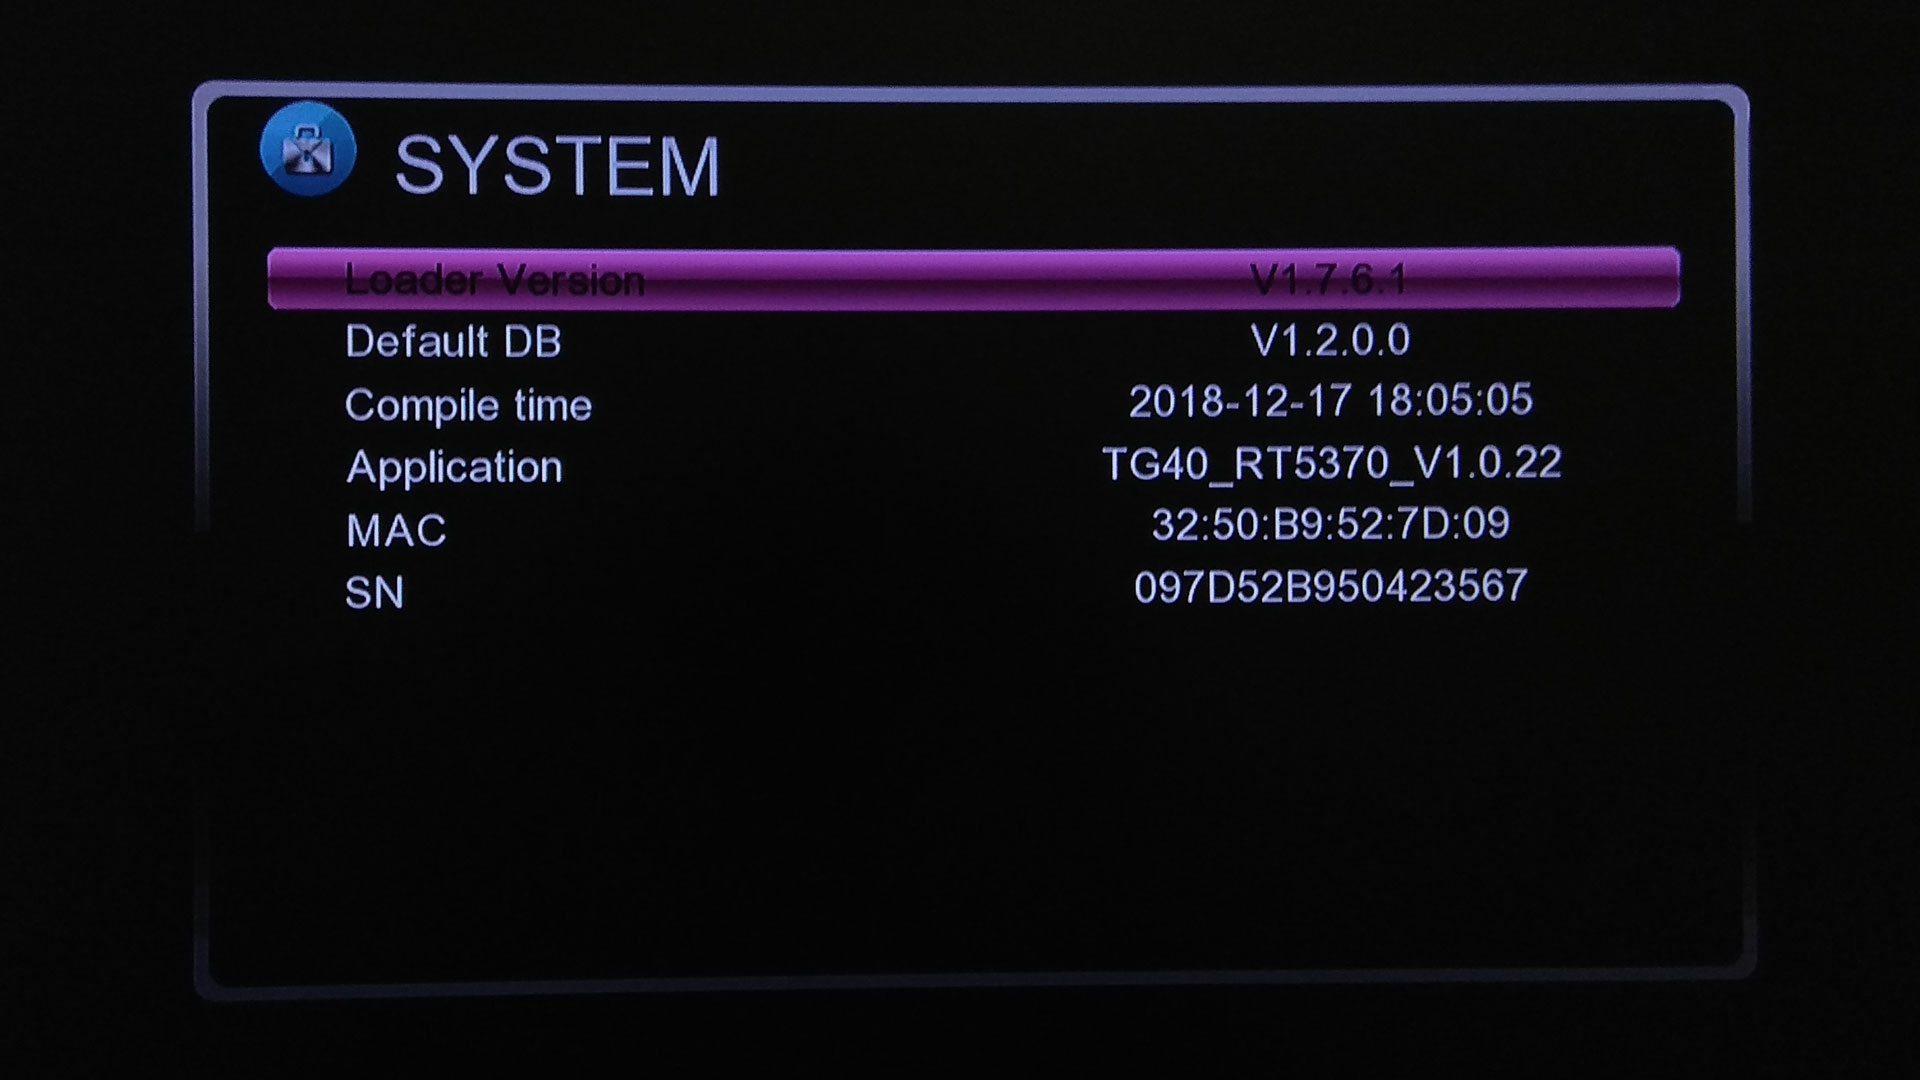 redline tg 40 hd software download New Update Firmware Receiver